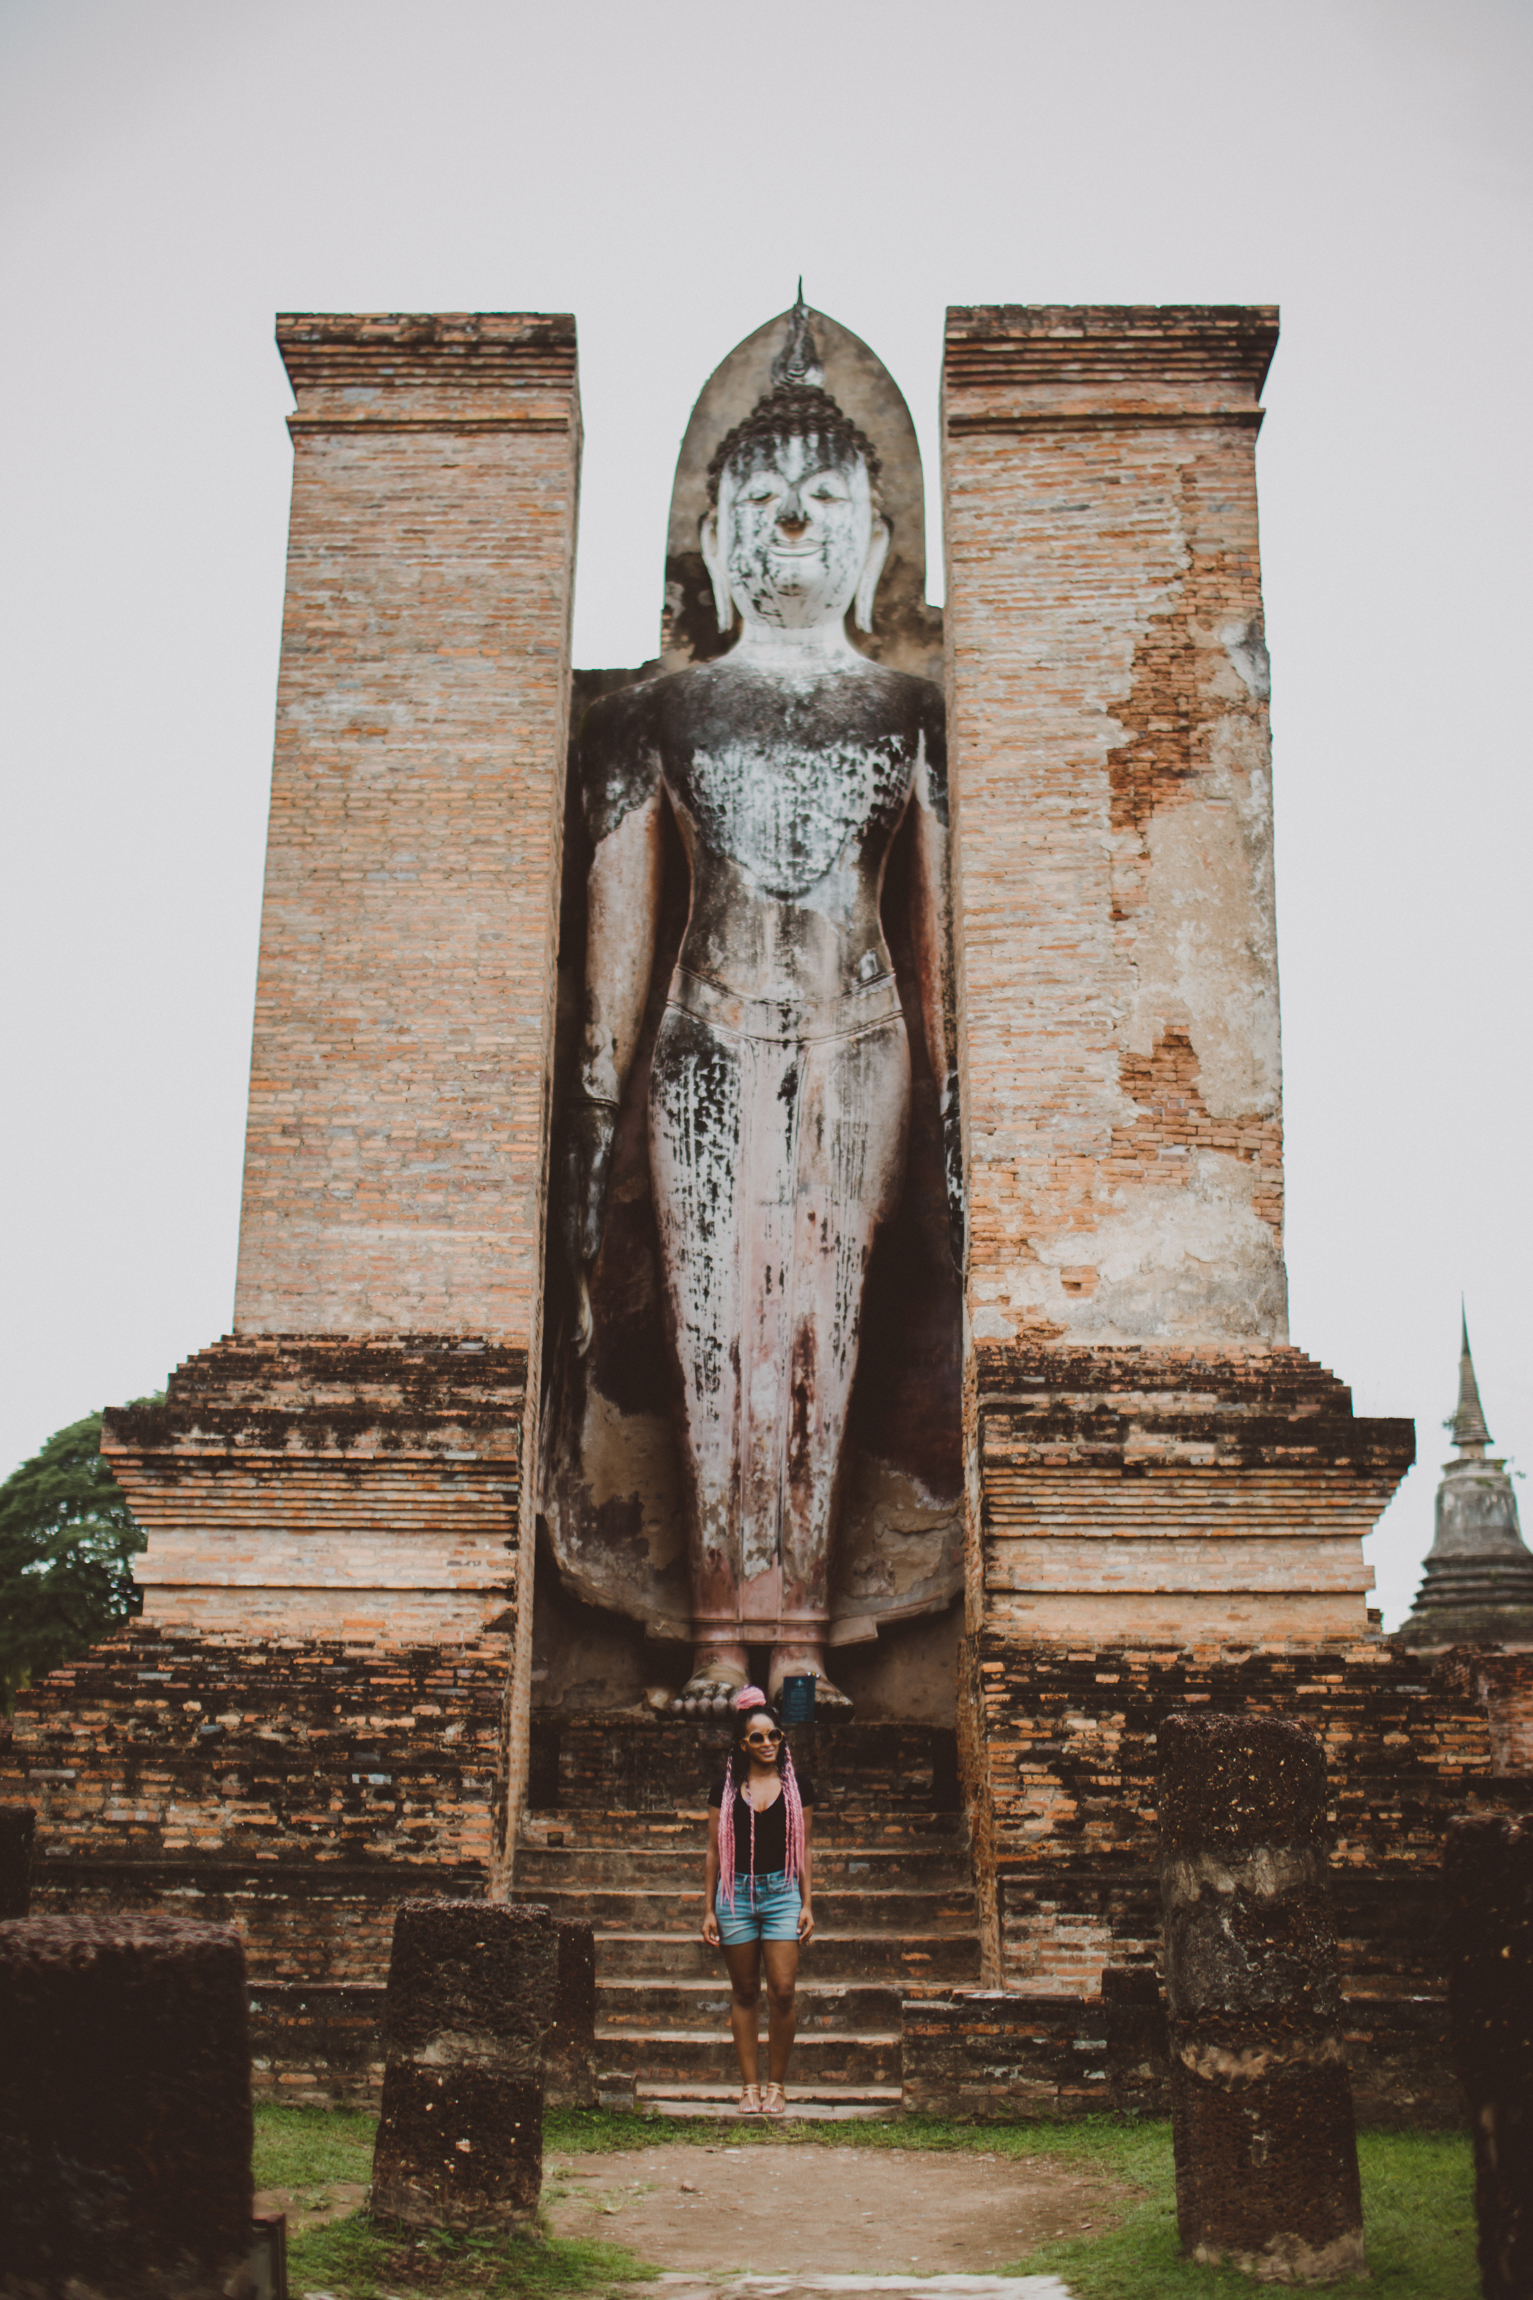 thailand-23-2.jpg